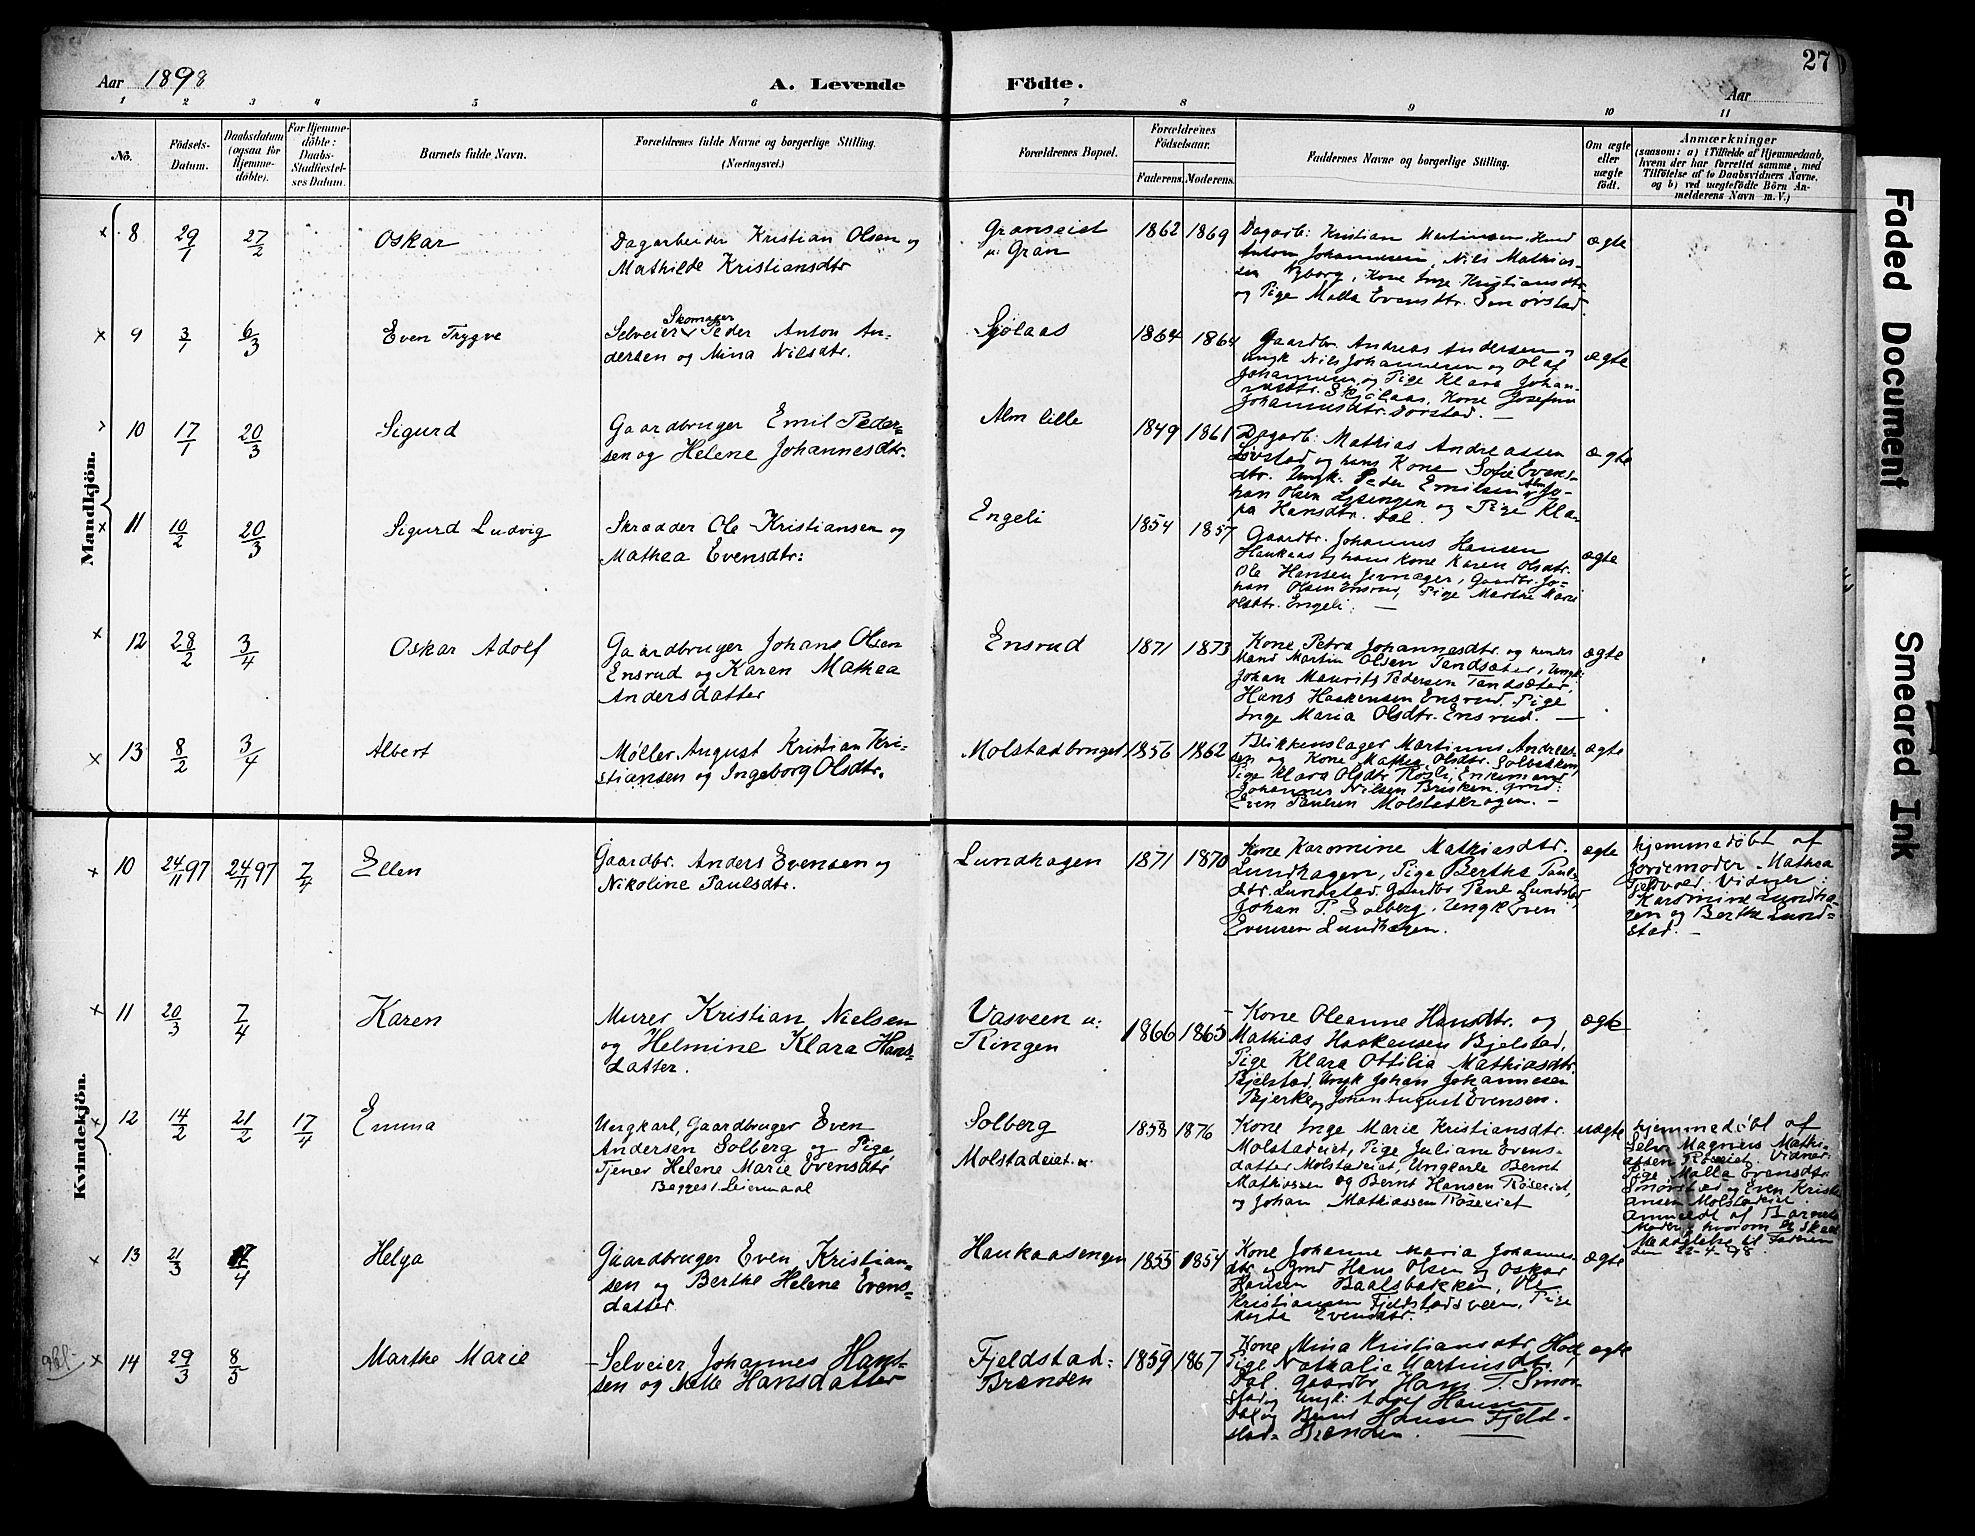 SAH, Vestre Toten prestekontor, H/Ha/Haa/L0013: Ministerialbok nr. 13, 1895-1911, s. 27